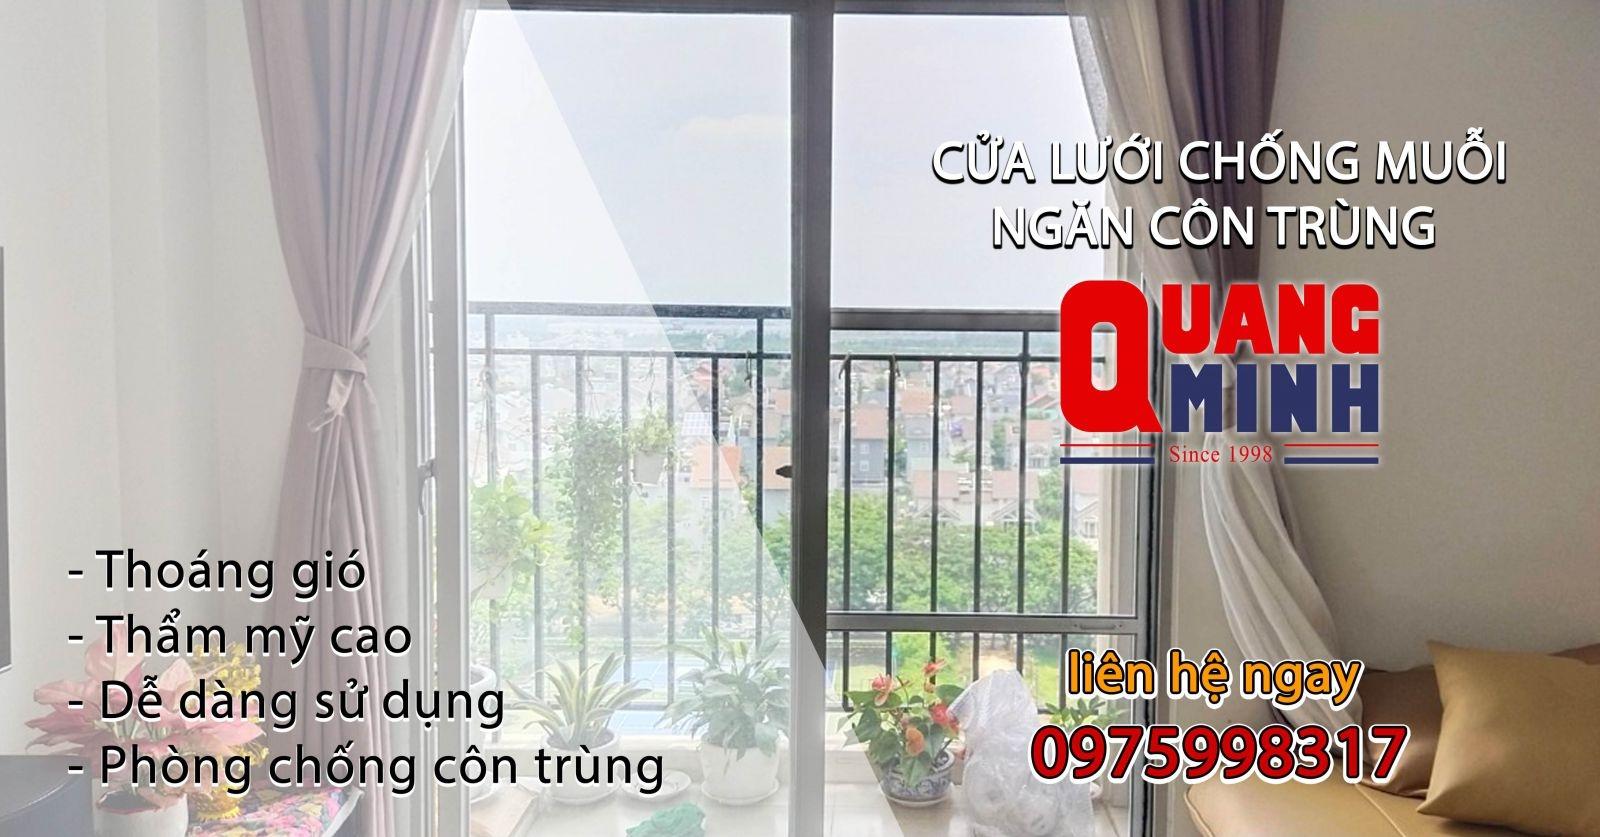 cualuoichongmuoiquan9 (@cualuoichongmuoiquan9) Cover Image